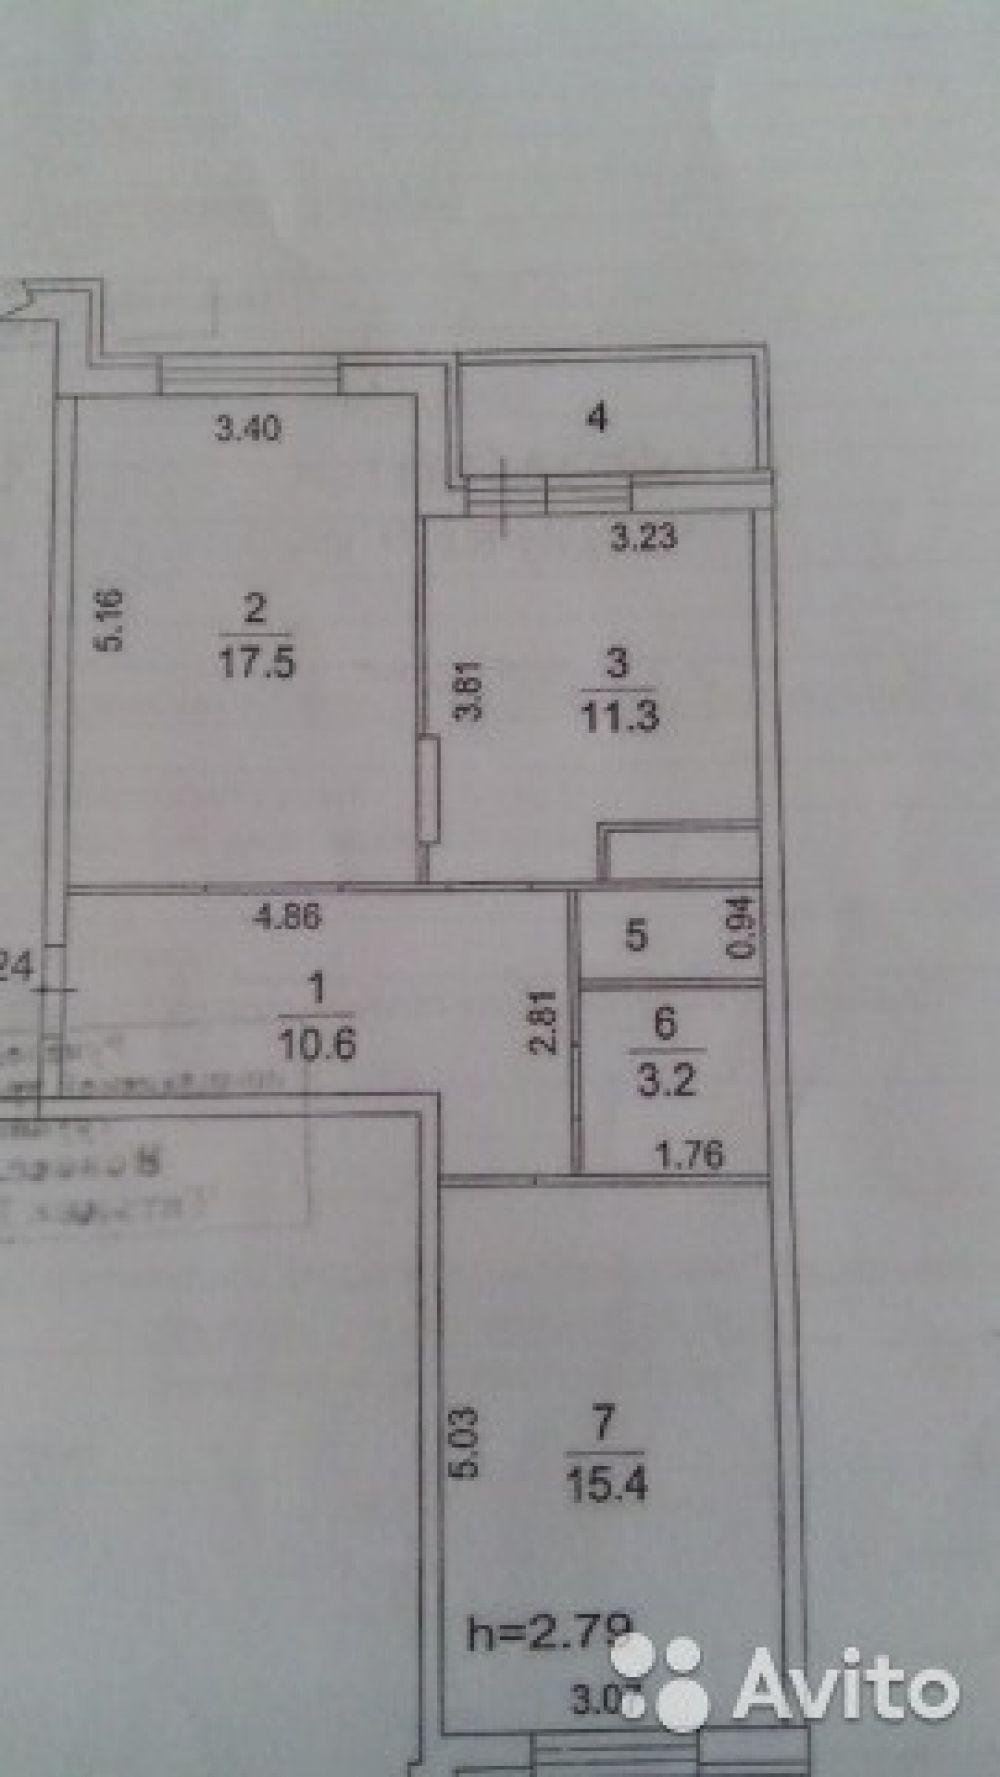 Двухкомнатная квартира  60 м2, микрорайон Богородский 6, фото 19